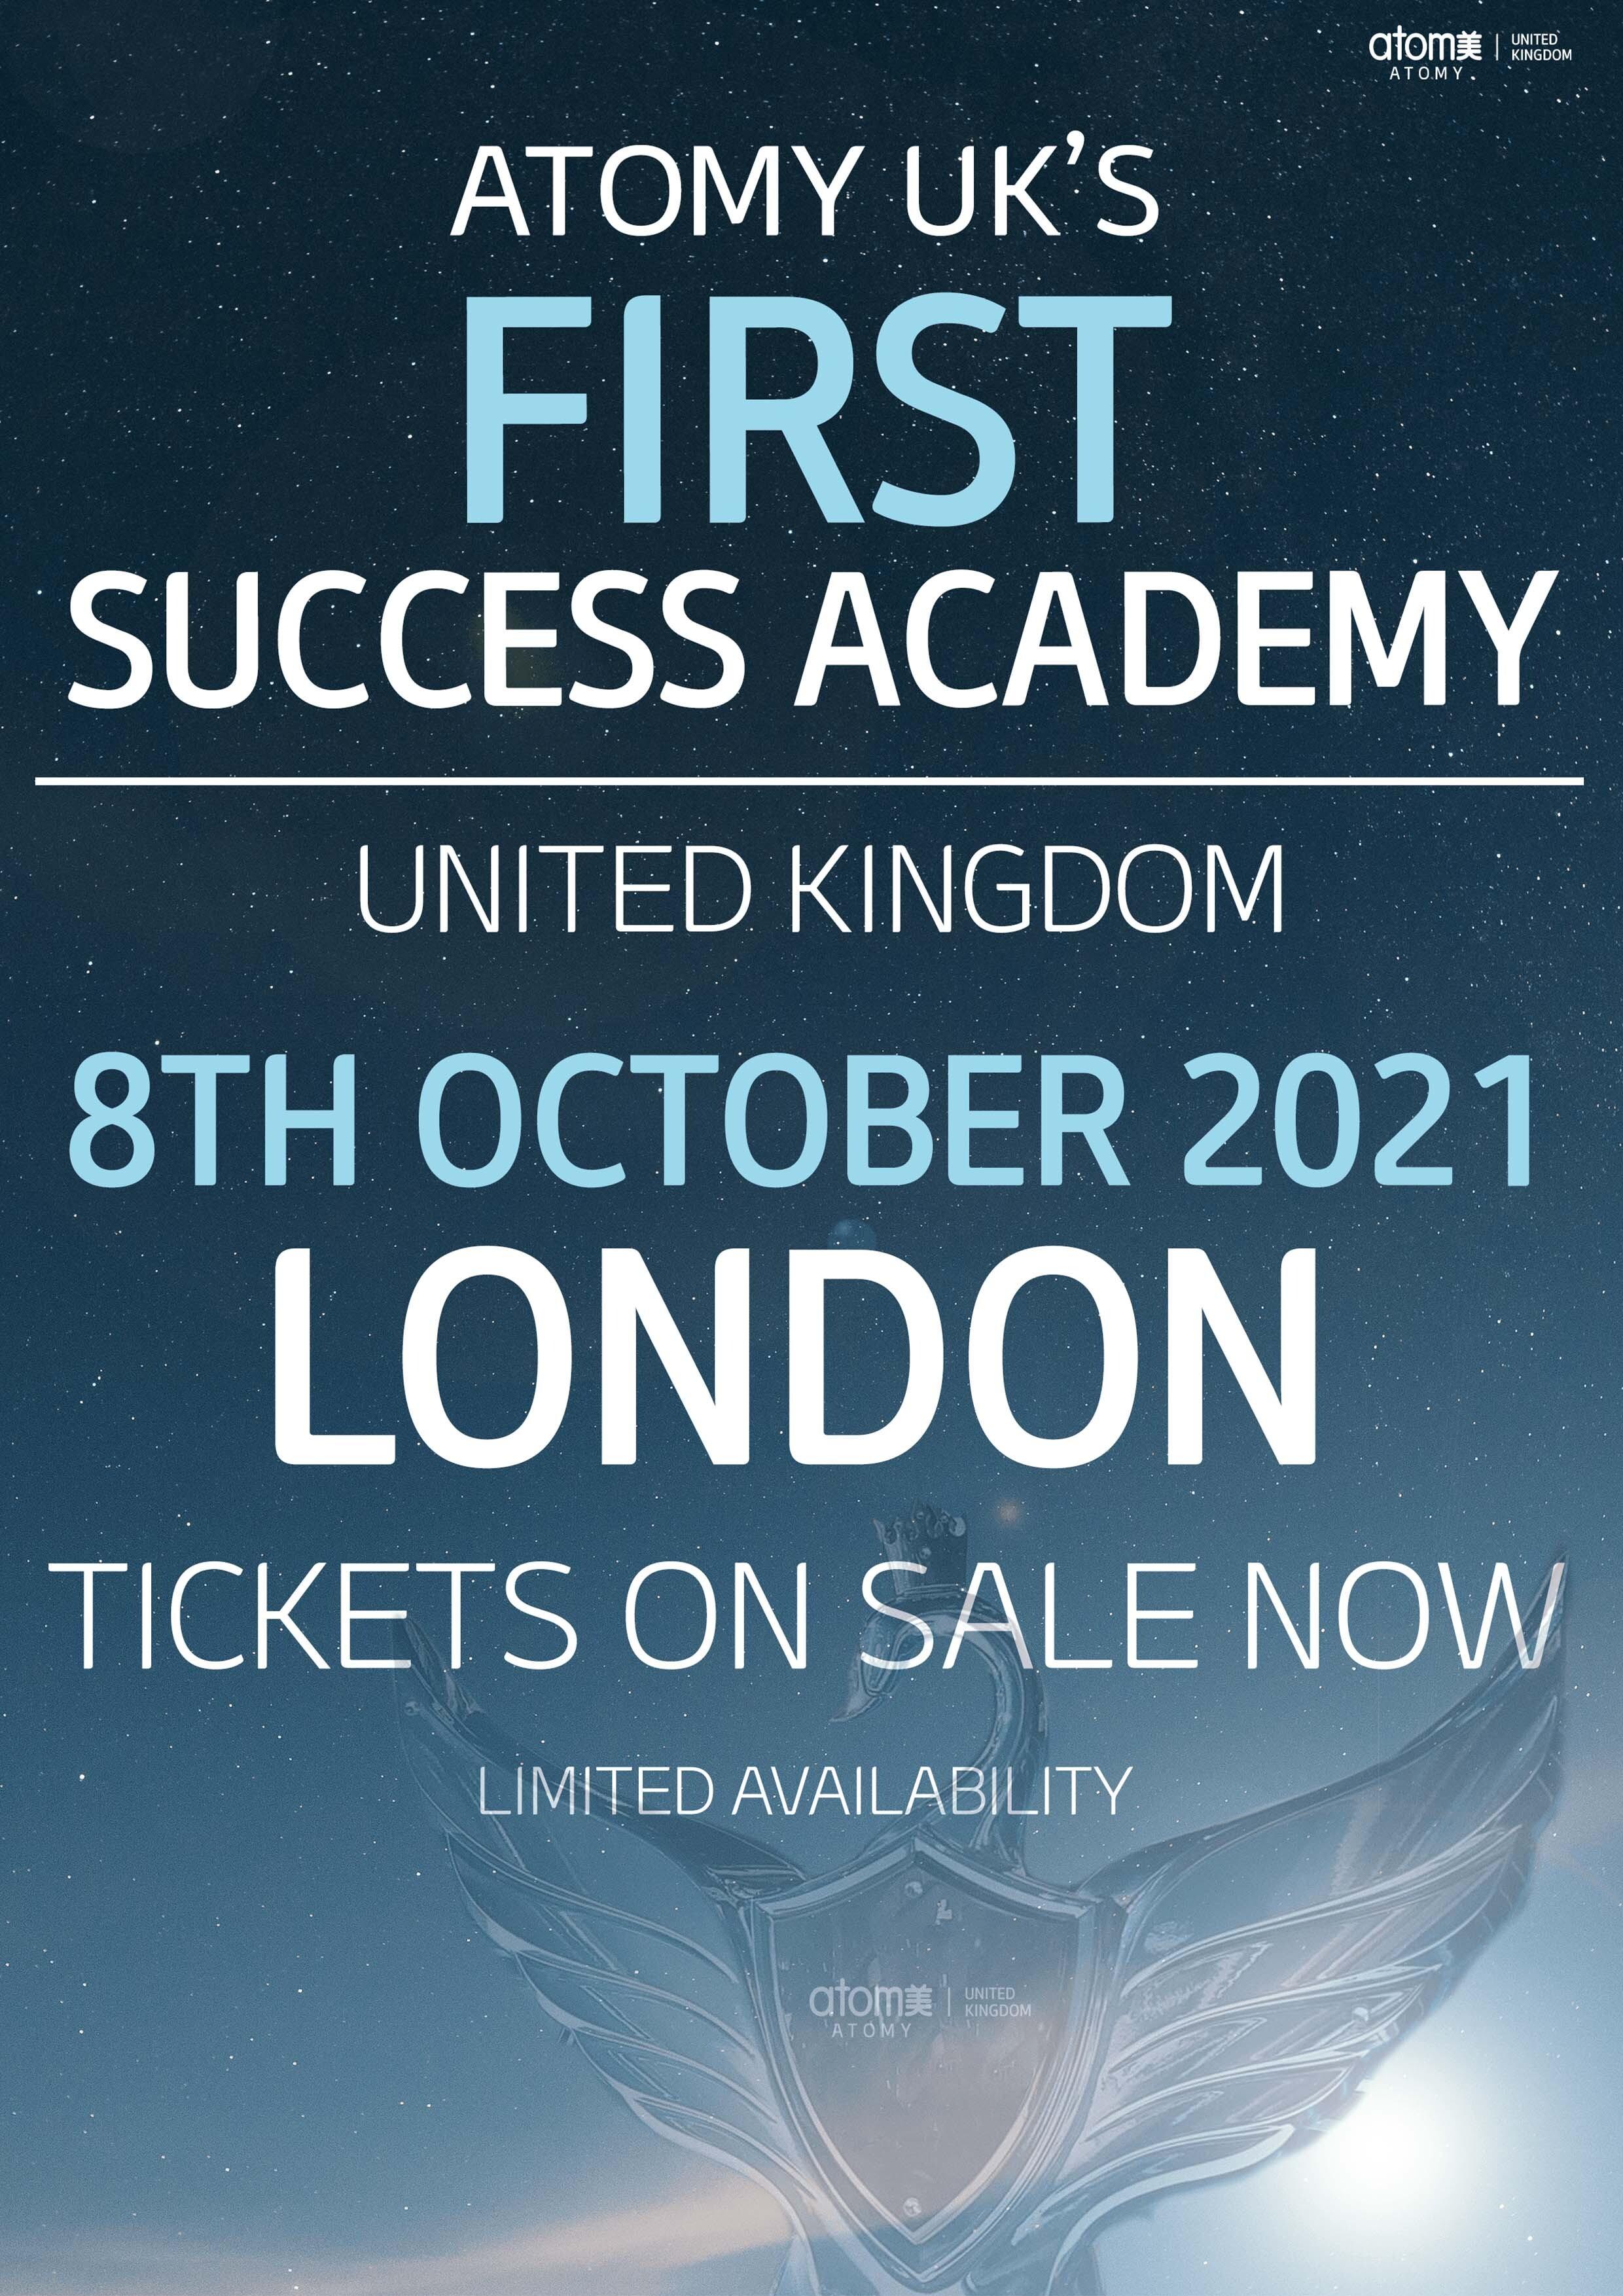 Atomy UK First Ever Success Academy